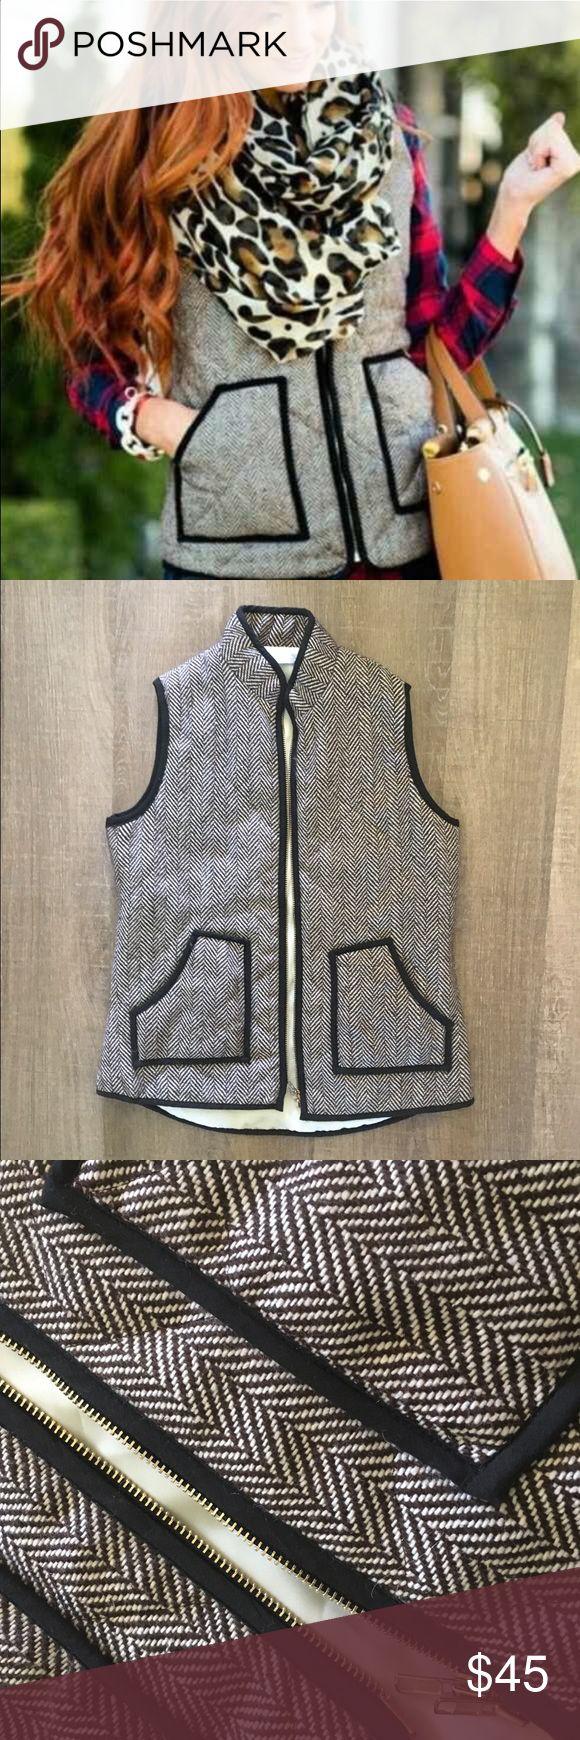 Hemline Mom Herringbone Vest Size Large  Hemline Mom Herringbone Vest Jackets & Coats Vests